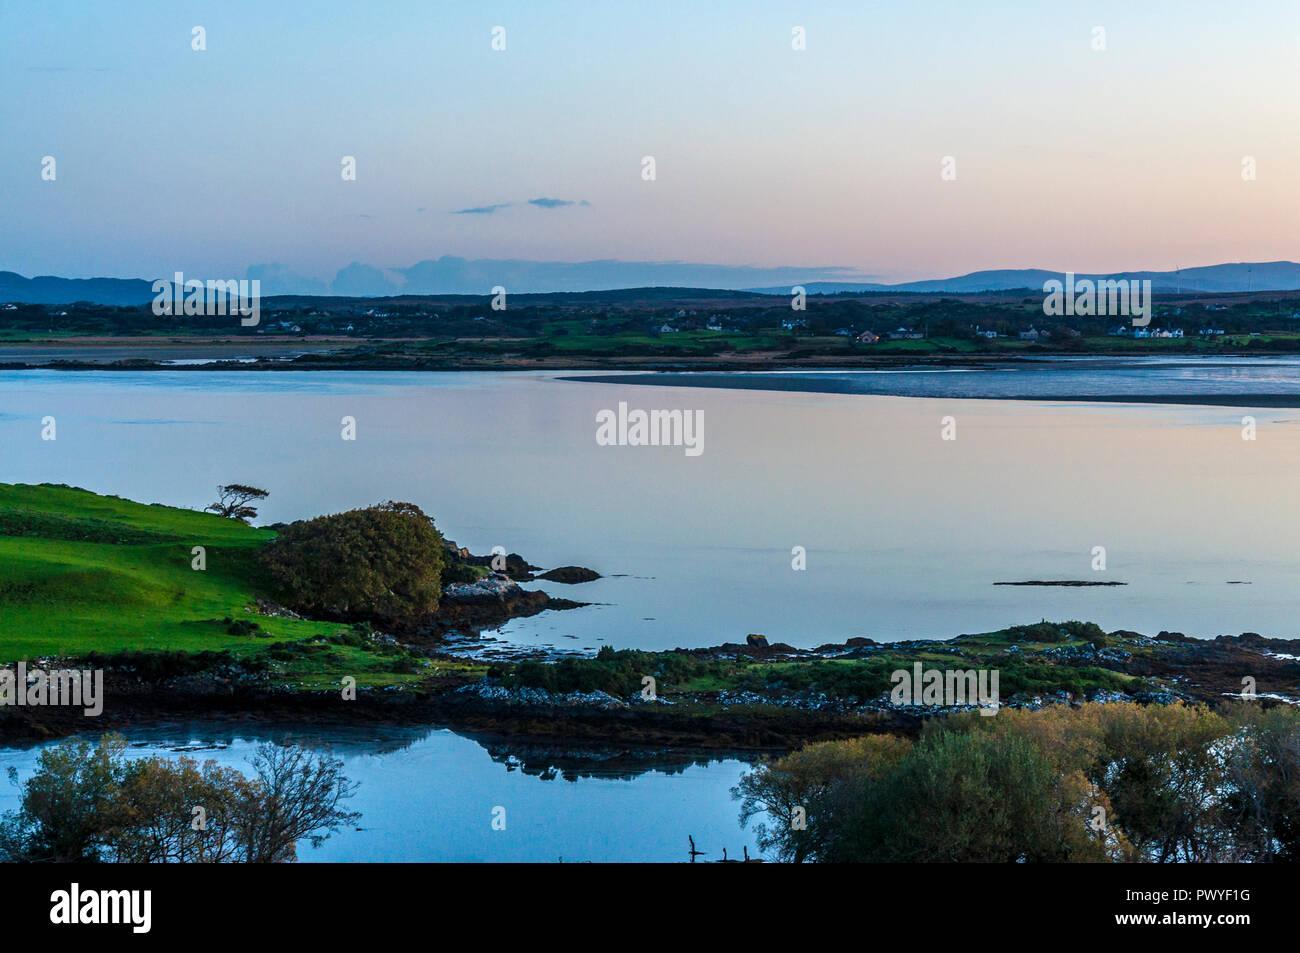 Dawn light over Loughros Mor, or More, Bay, Ardara, County Donegal, Ireland - Stock Image